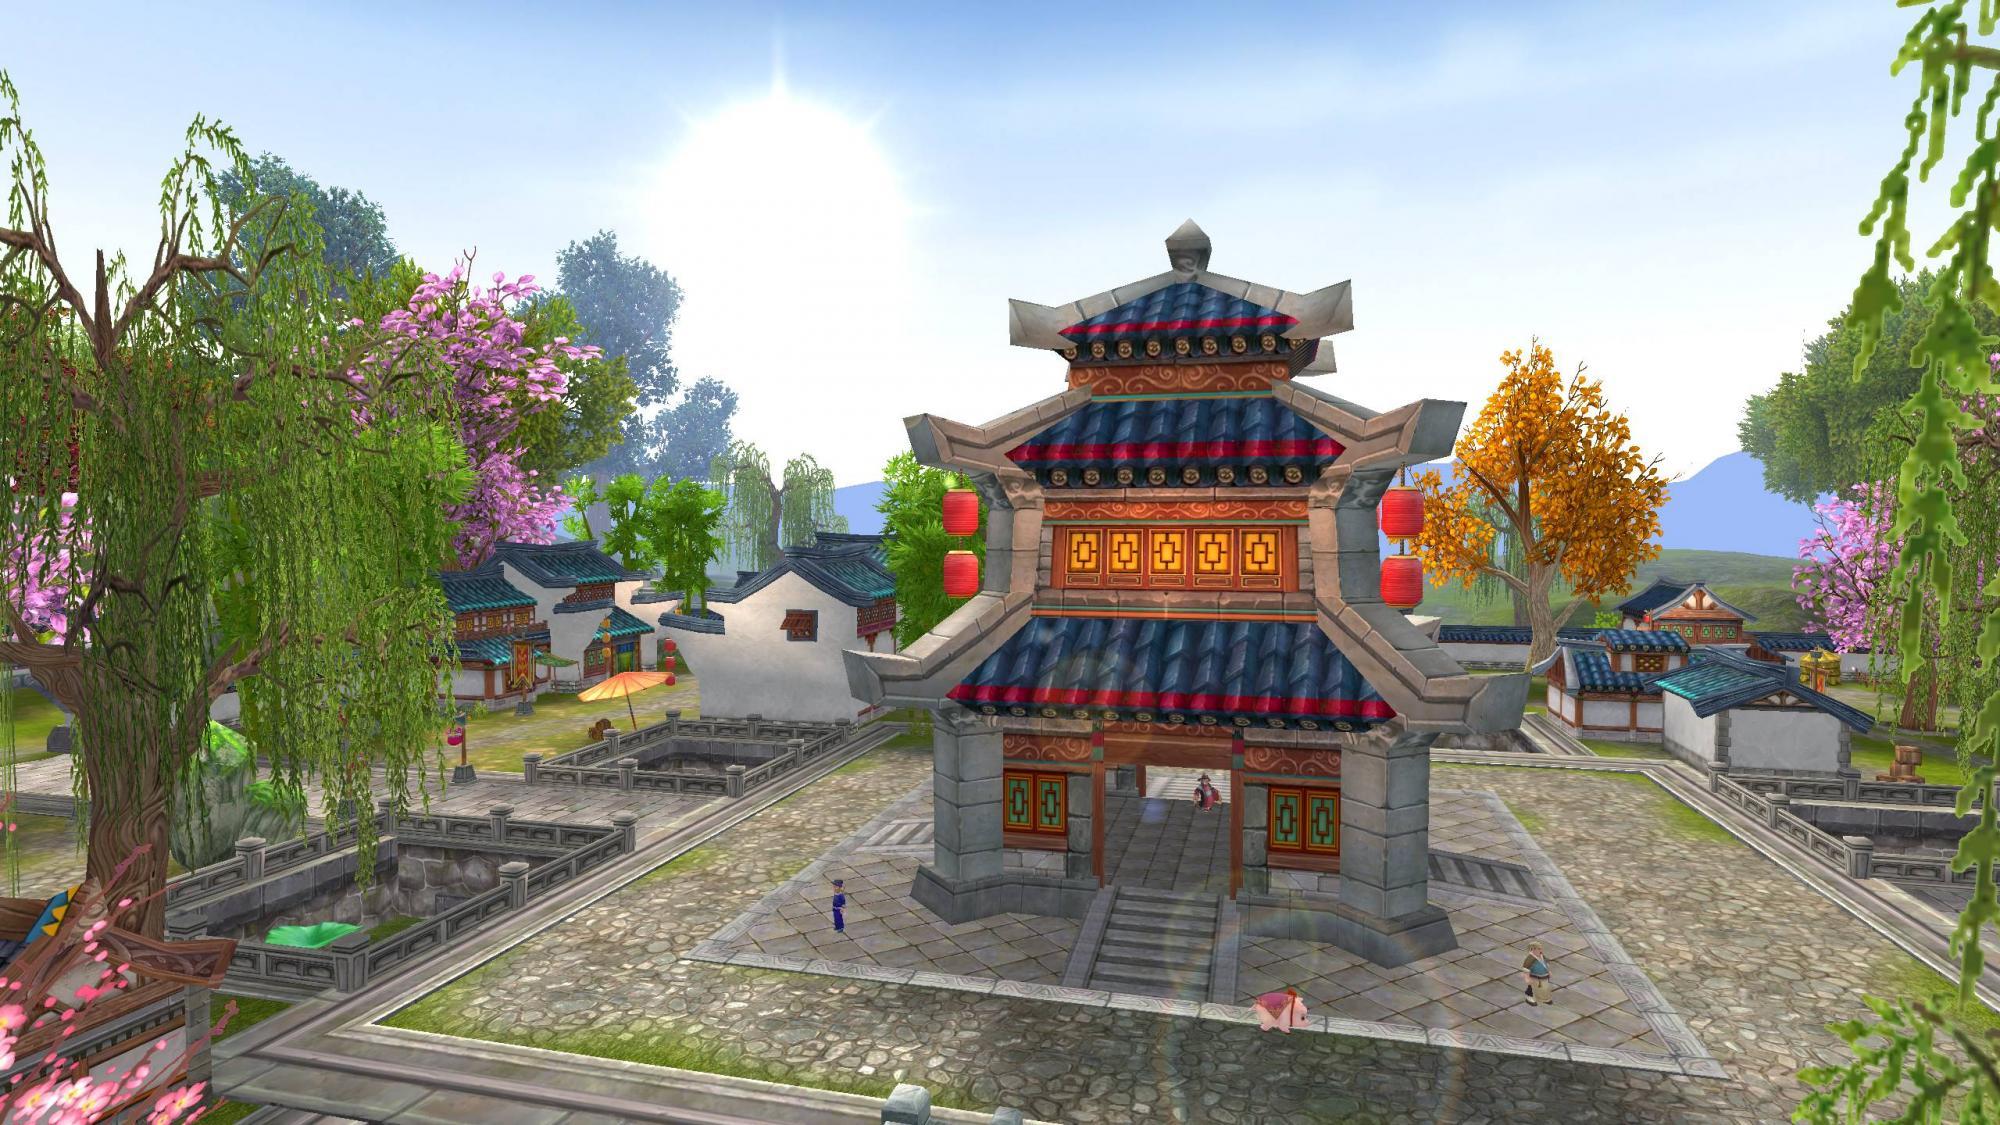 Click image for larger version.Name:Legend of Martial Arts 23.jpgViews:203Size:381.6 KBID:1073